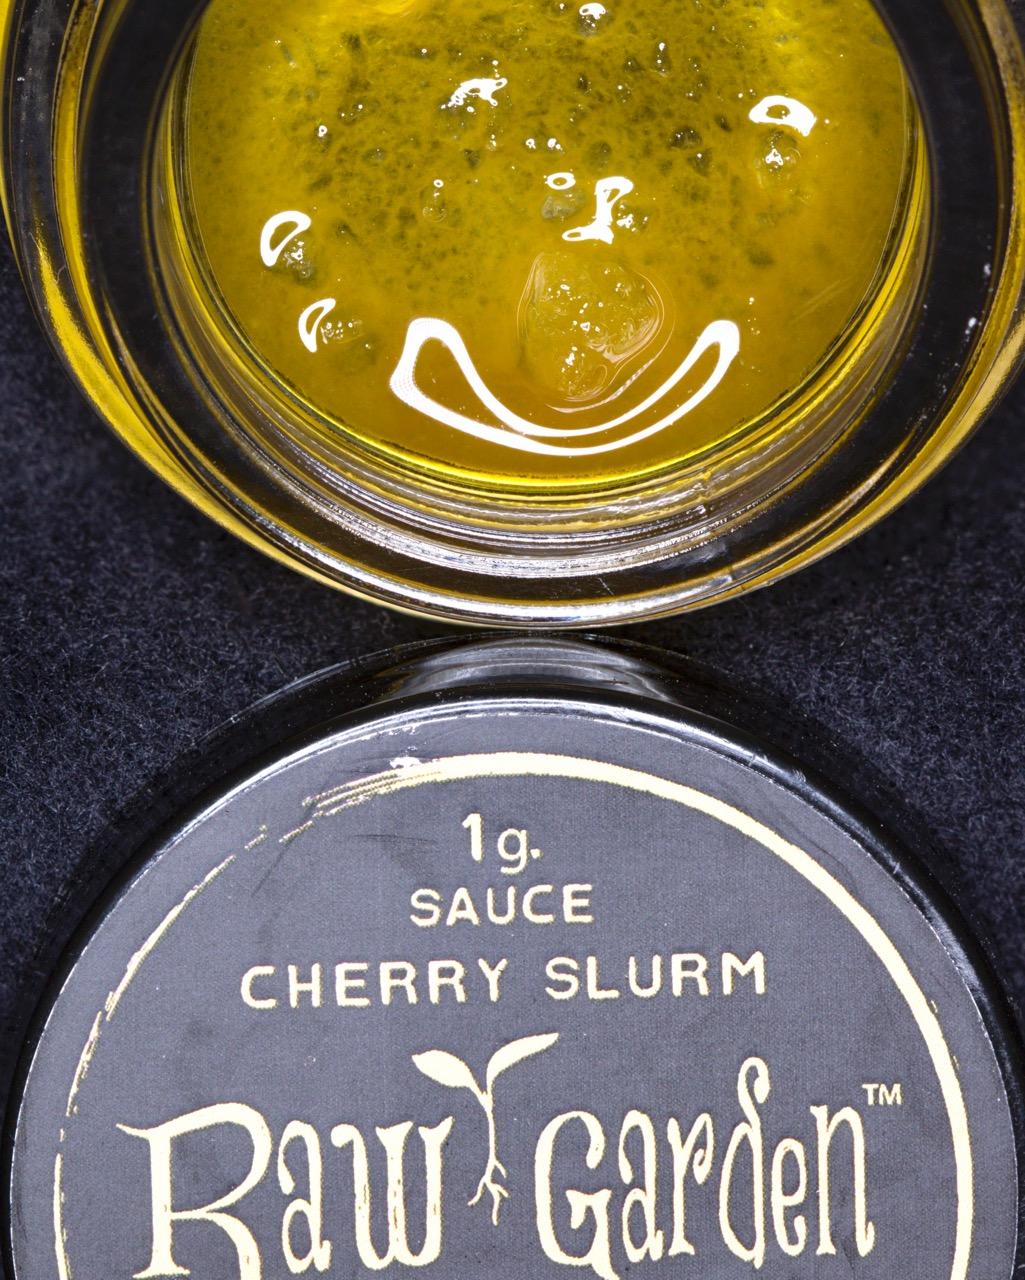 Cherry Slurm live-resin sauce by Raw Garden.